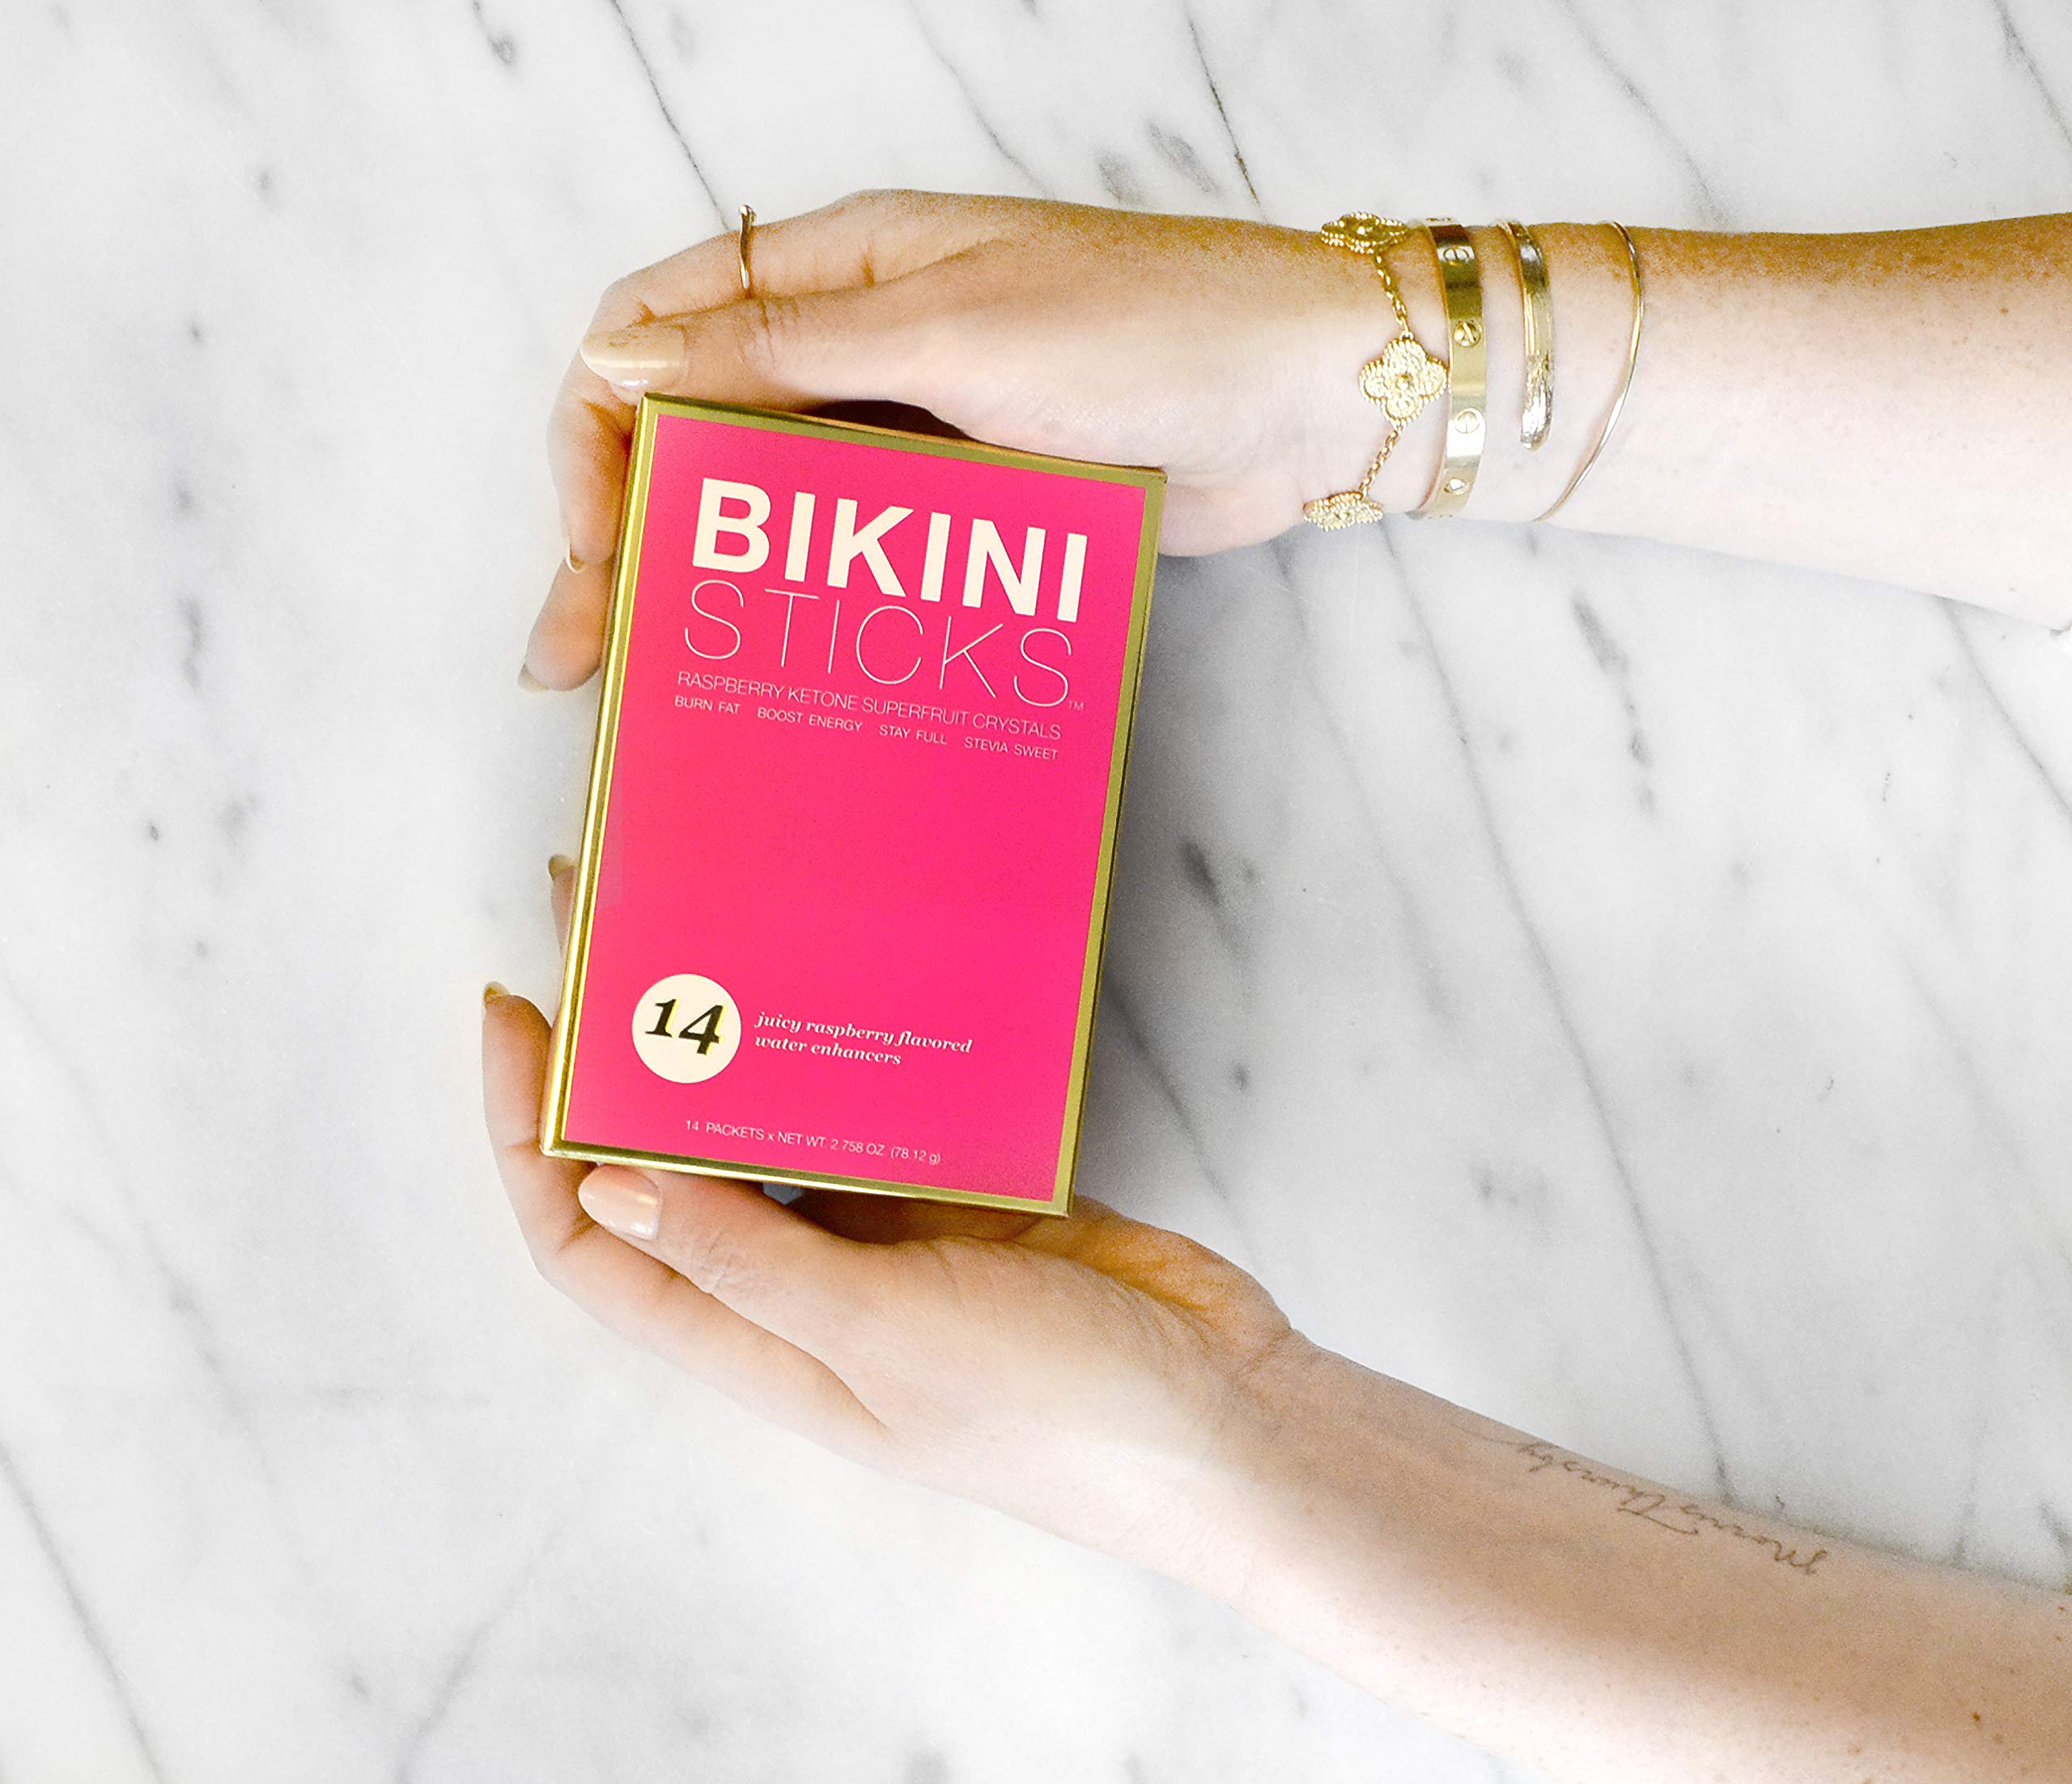 Bikini Sticks by Bikini Cleanse